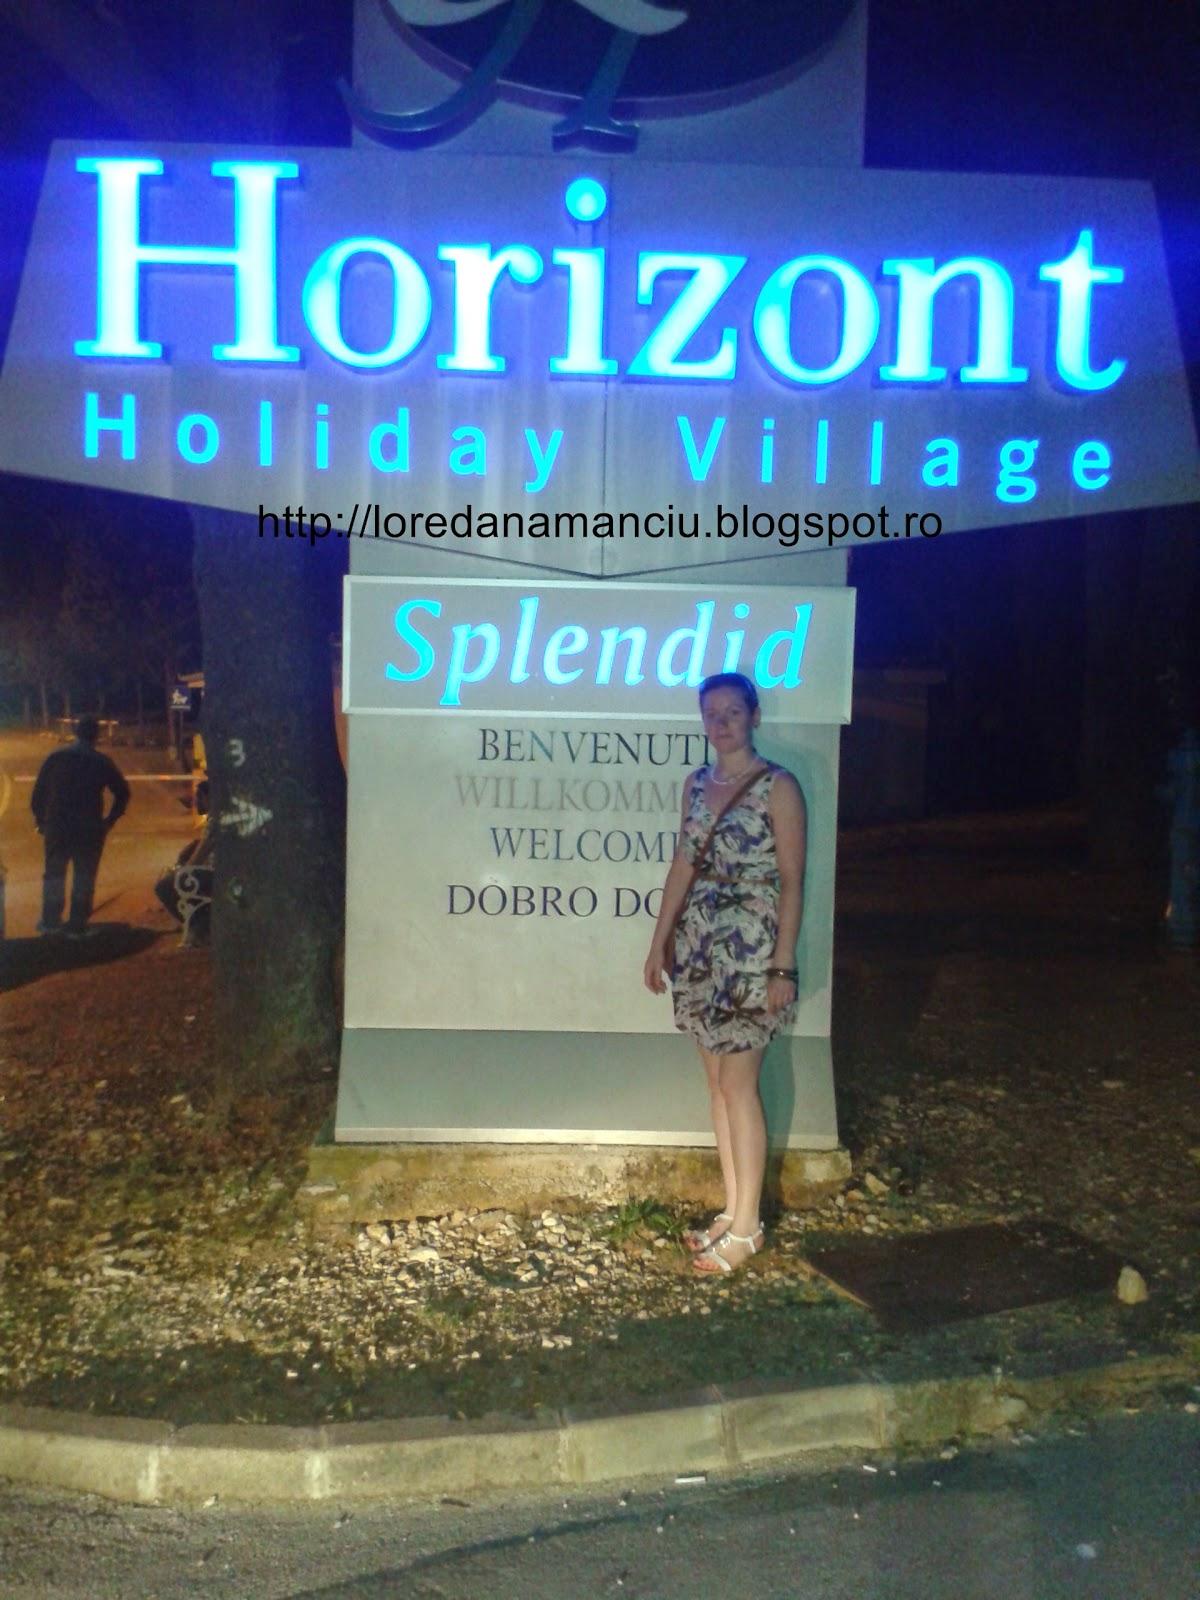 Horizont Holiday Village - Croatia, Pola